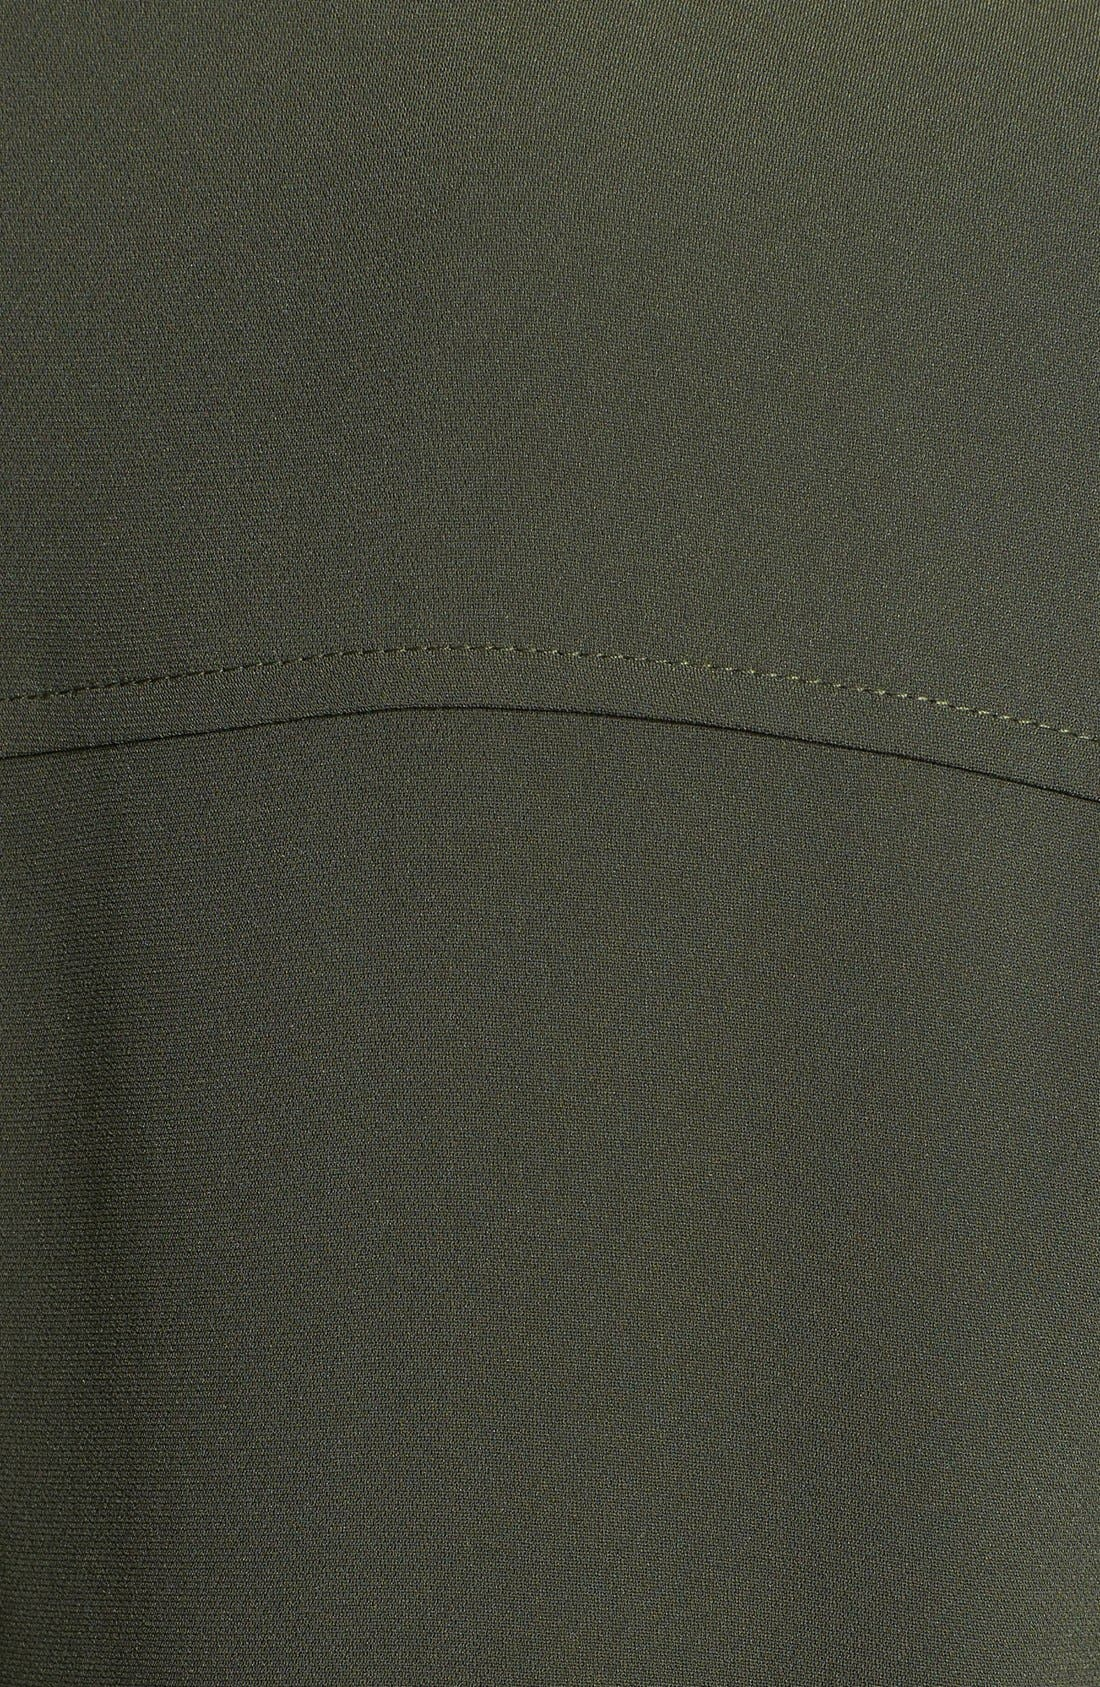 Alternate Image 4  - Diane von Furstenberg 'Agness' Woven Shift Dress